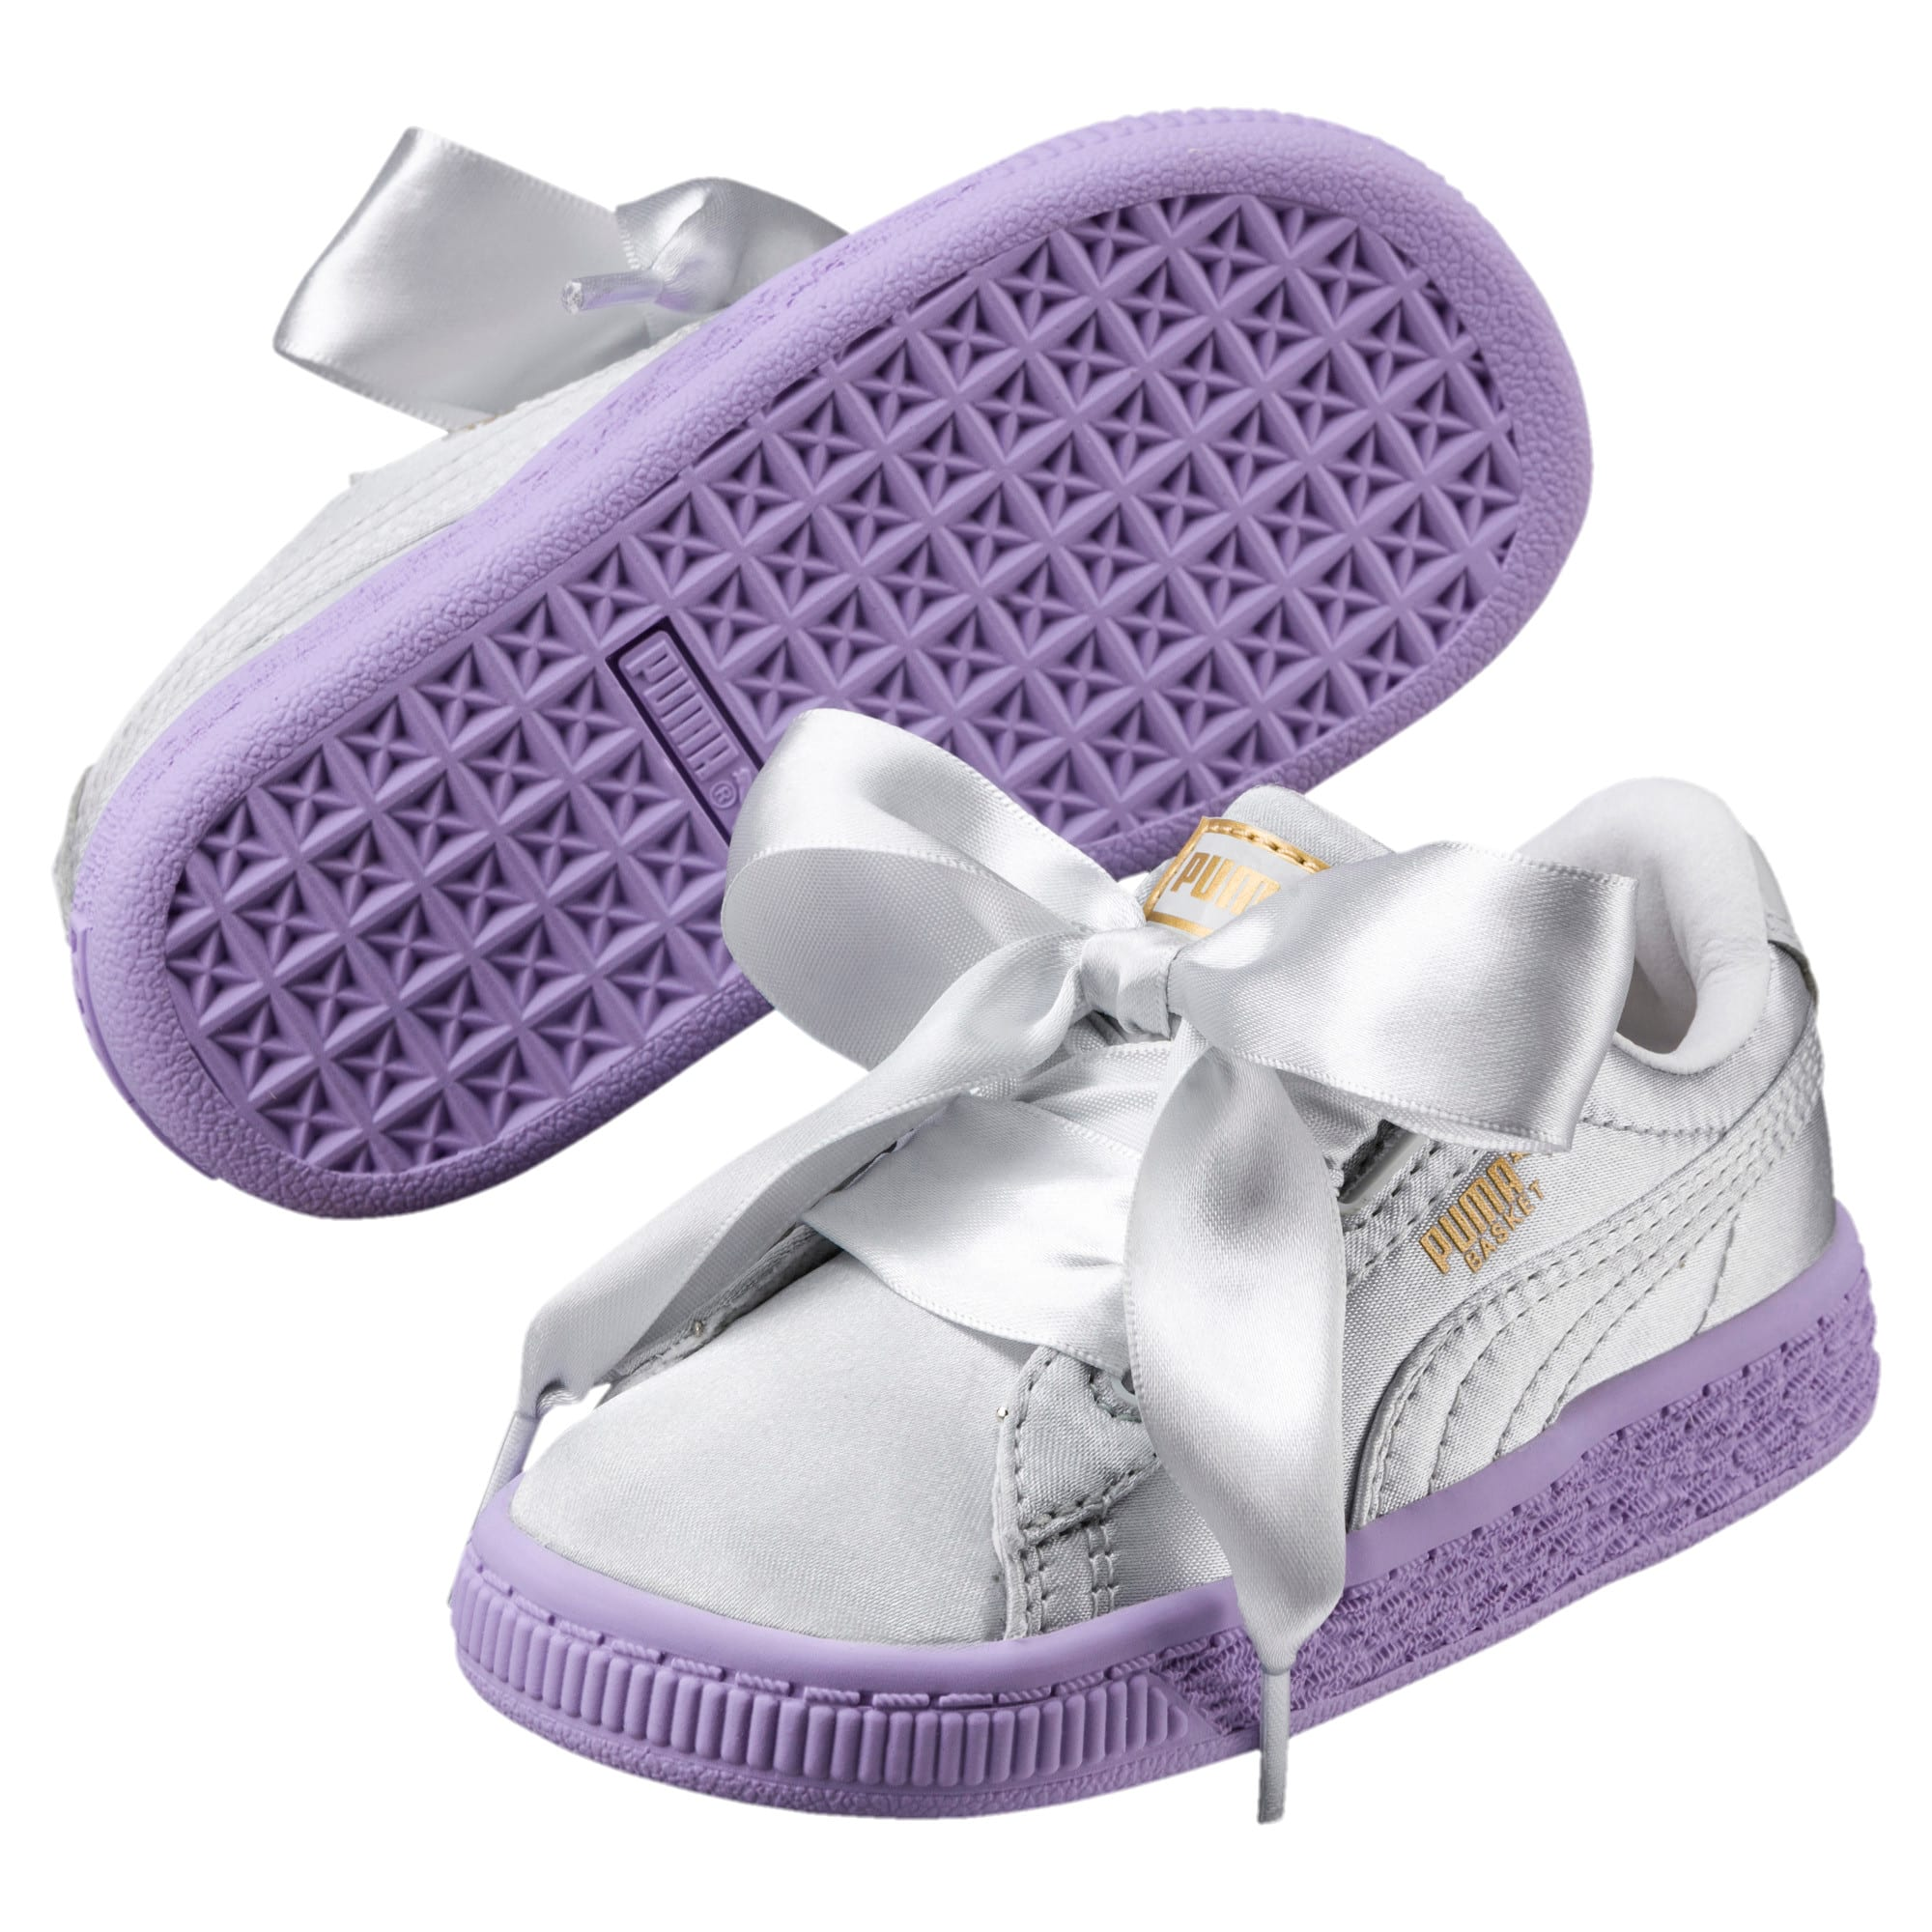 Thumbnail 2 of Basket Heart Toddler Shoes, Glacier Gray-Glacier Gray, medium